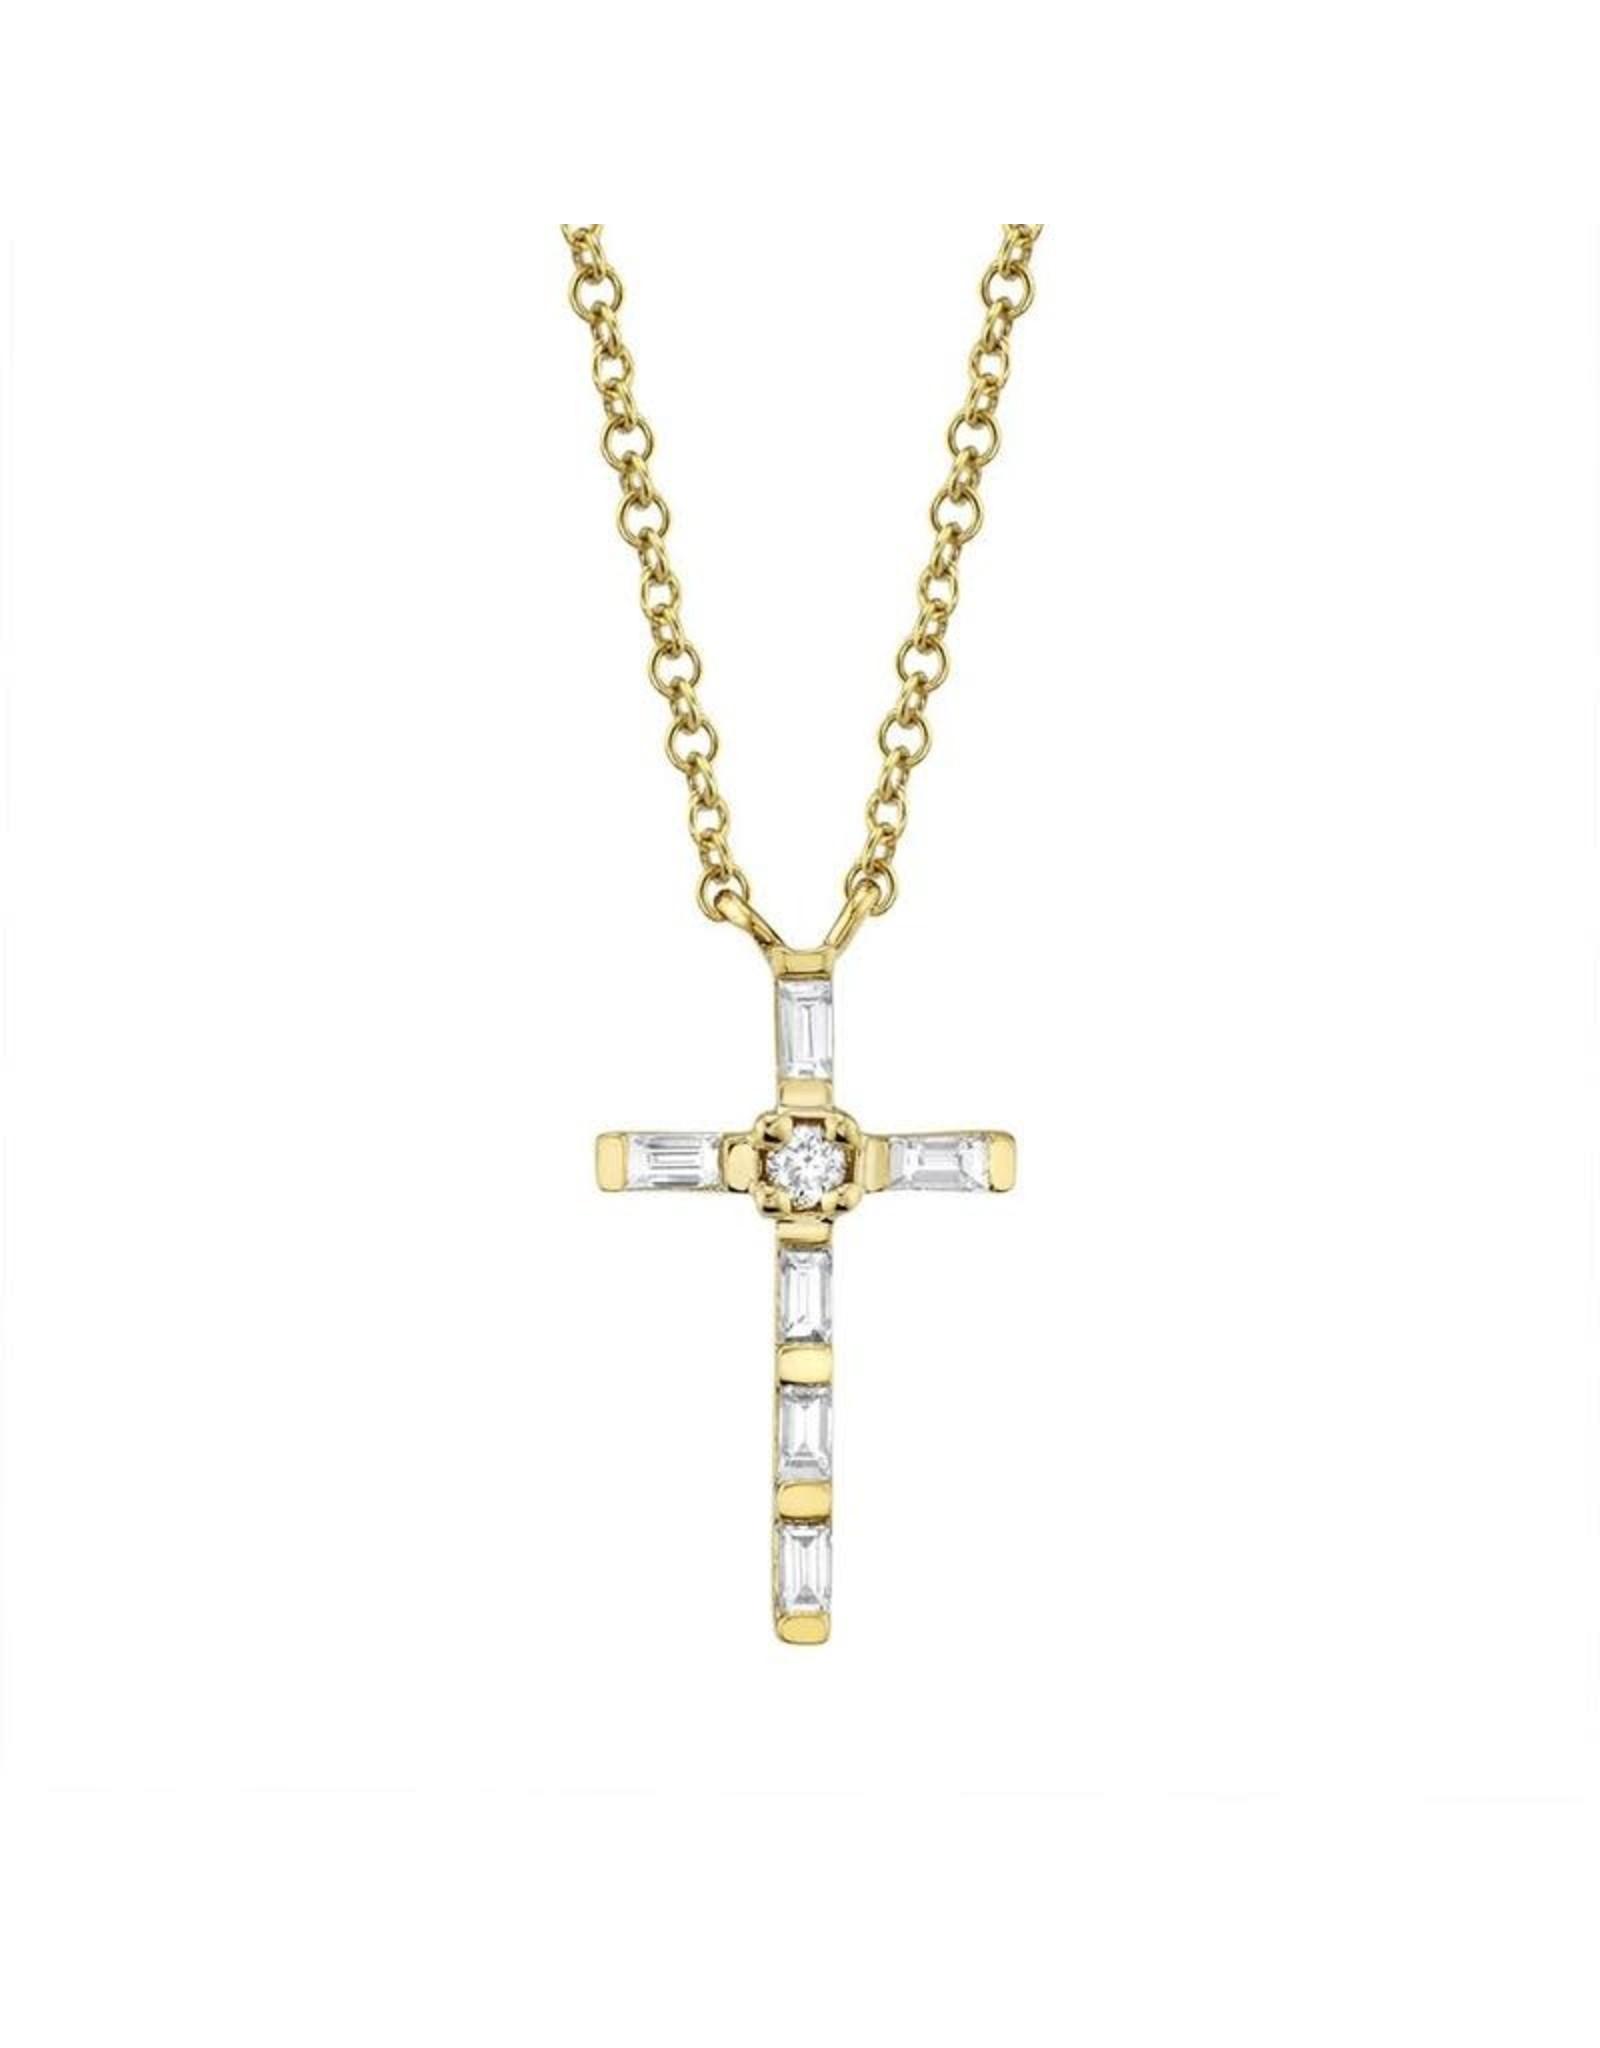 14K Yellow Gold Dainty Diamond Baguette Cross, D: 0.12ct